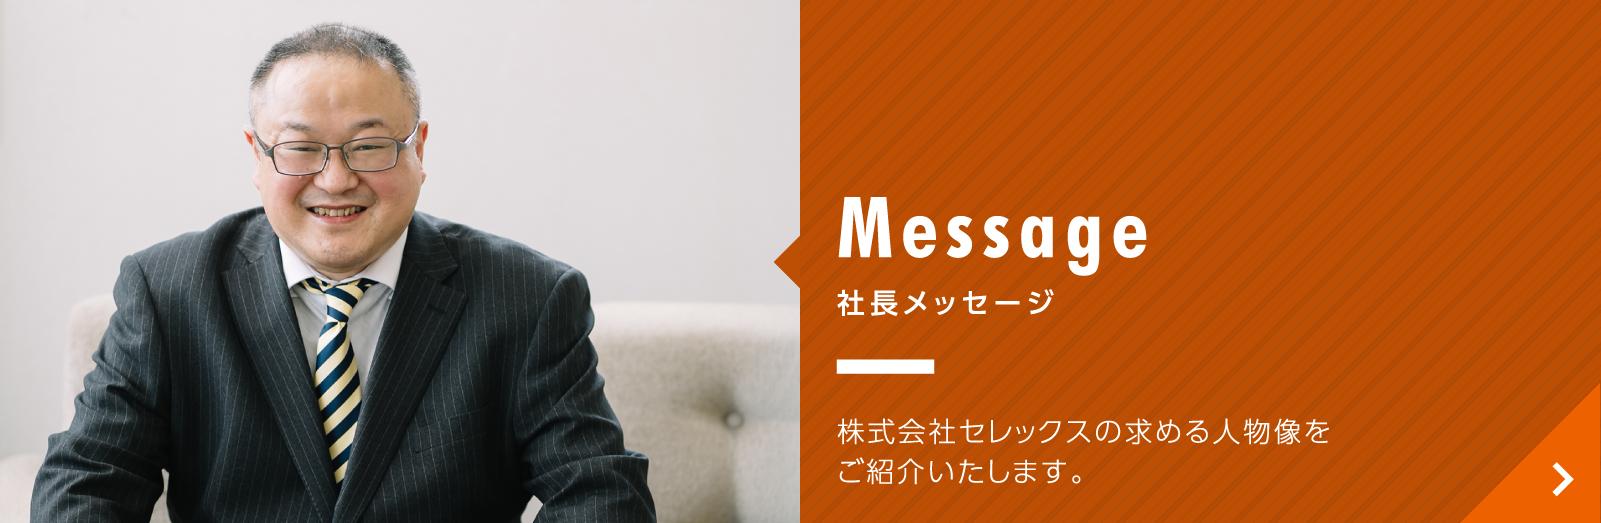 Message 代表メッセージ|株式会社セレックスの求める人物像をご紹介いたします。